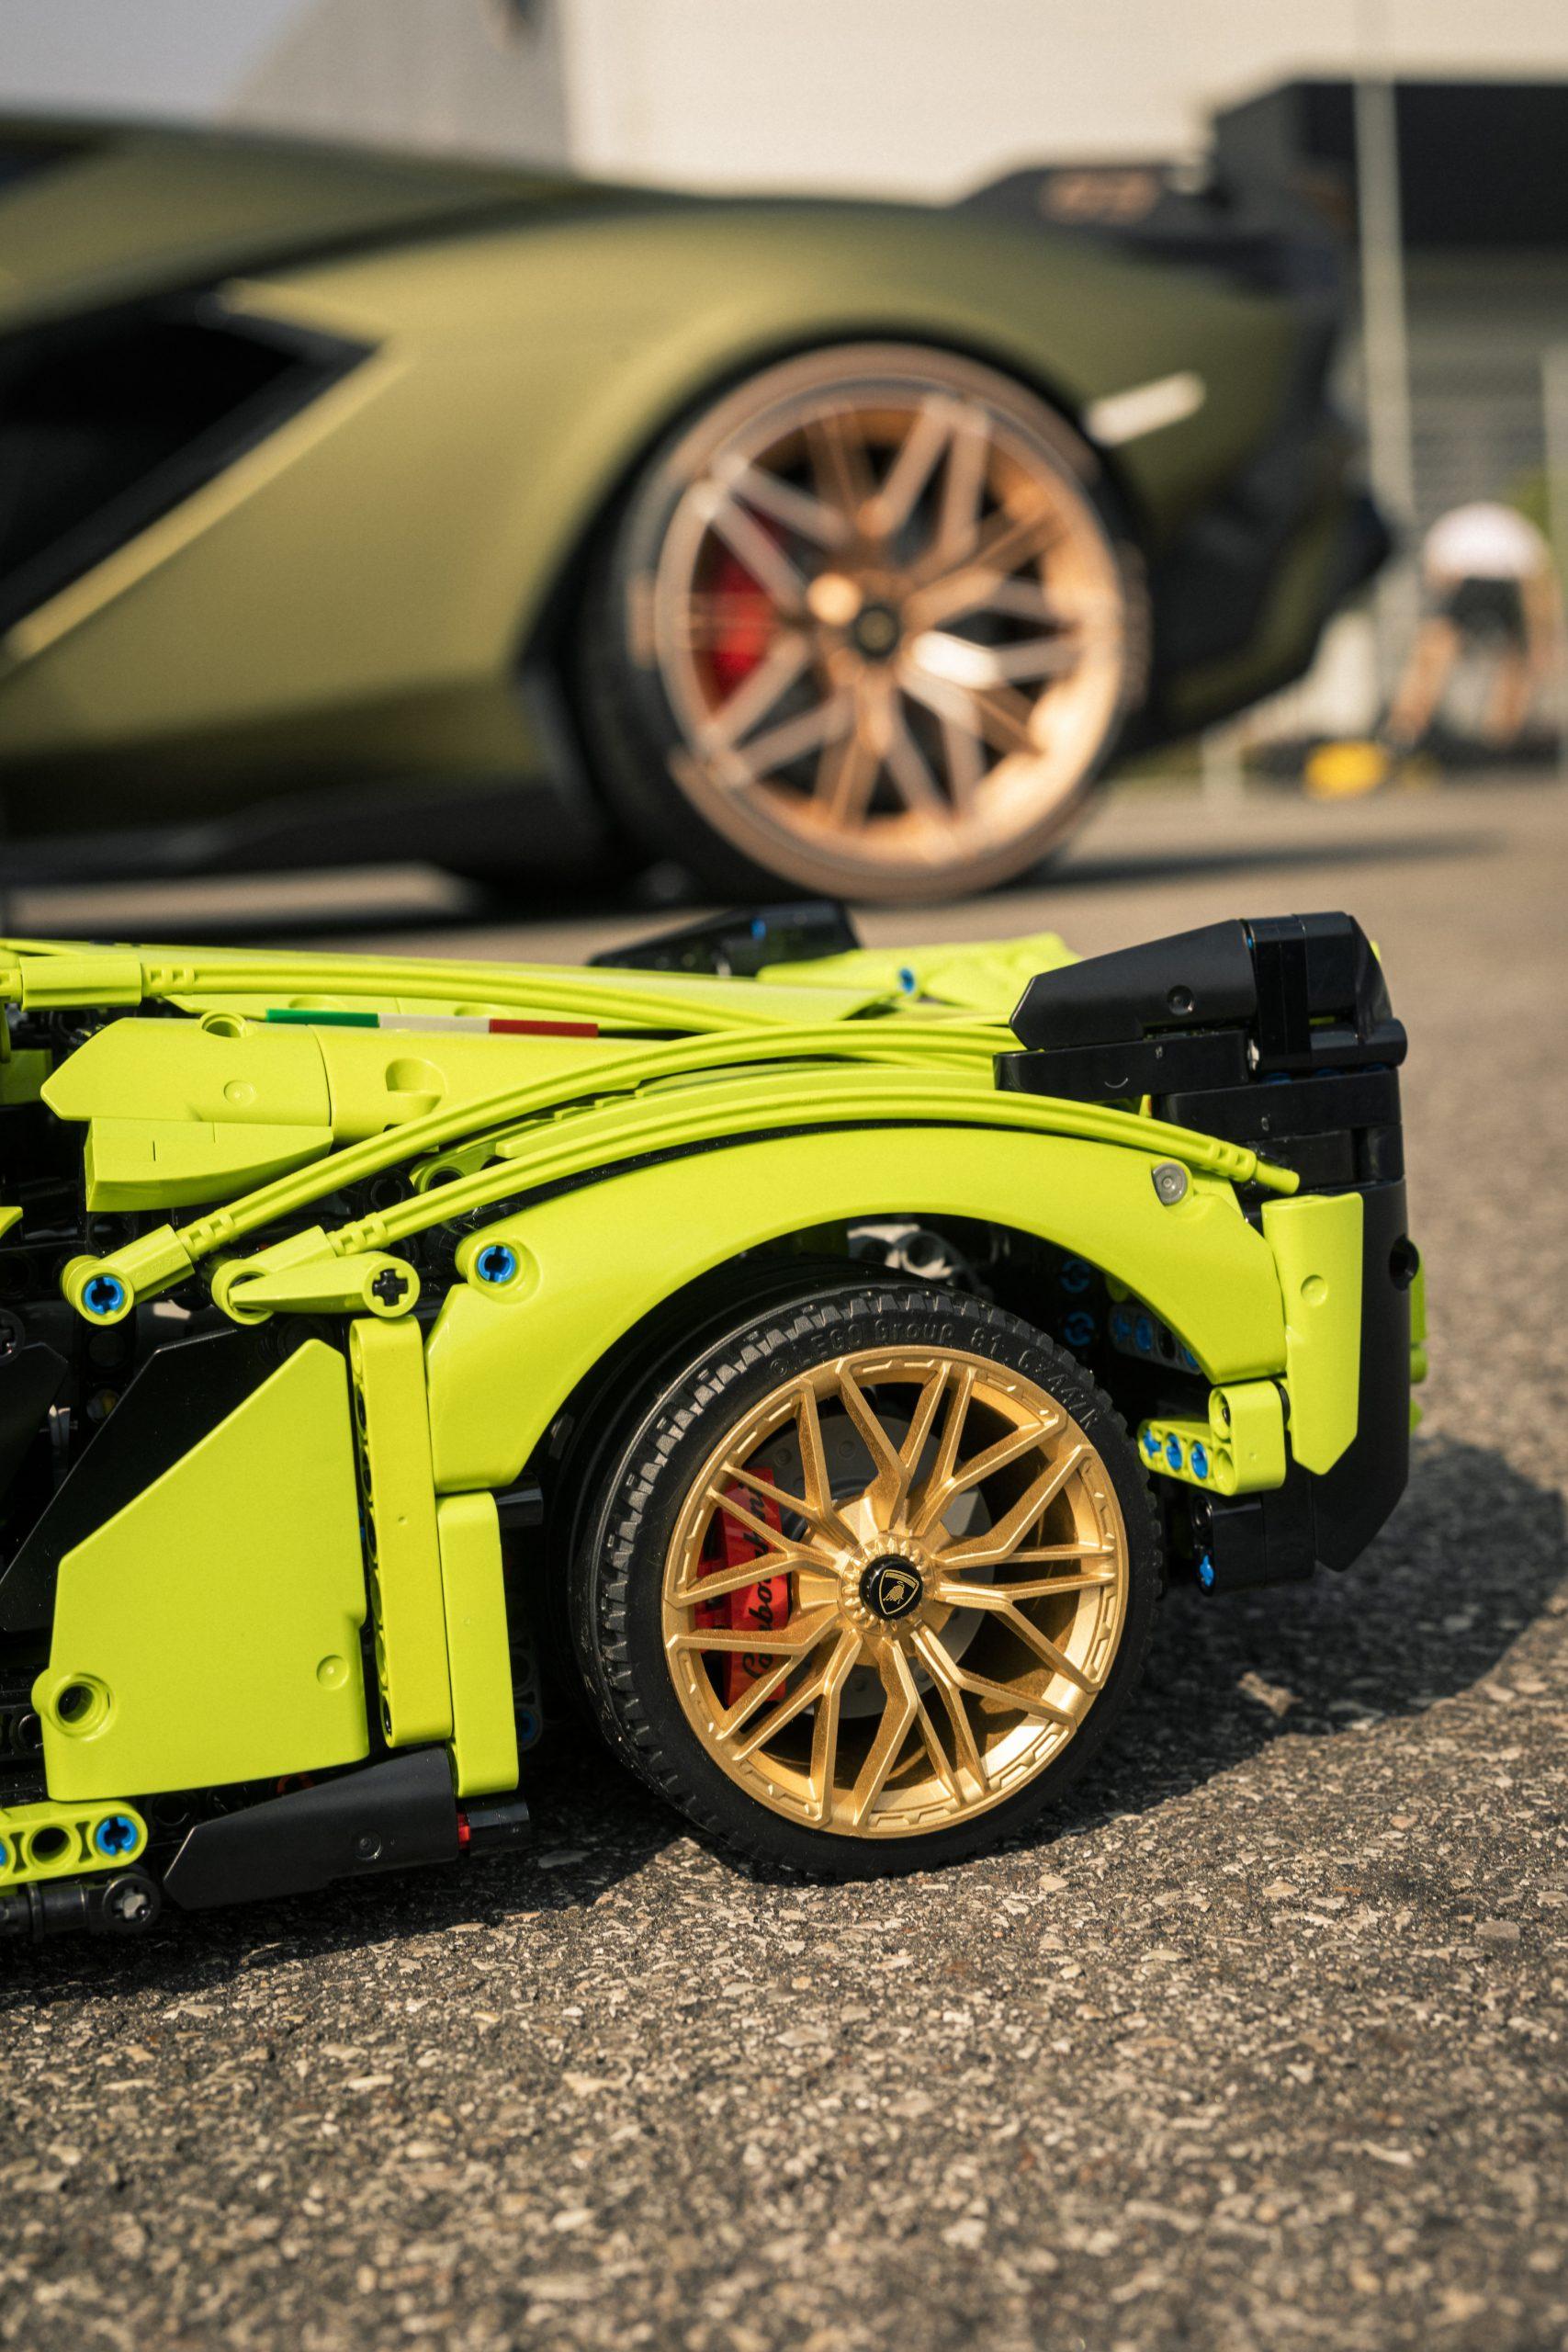 LEGO and Lamborghini Sian Rear Wheels